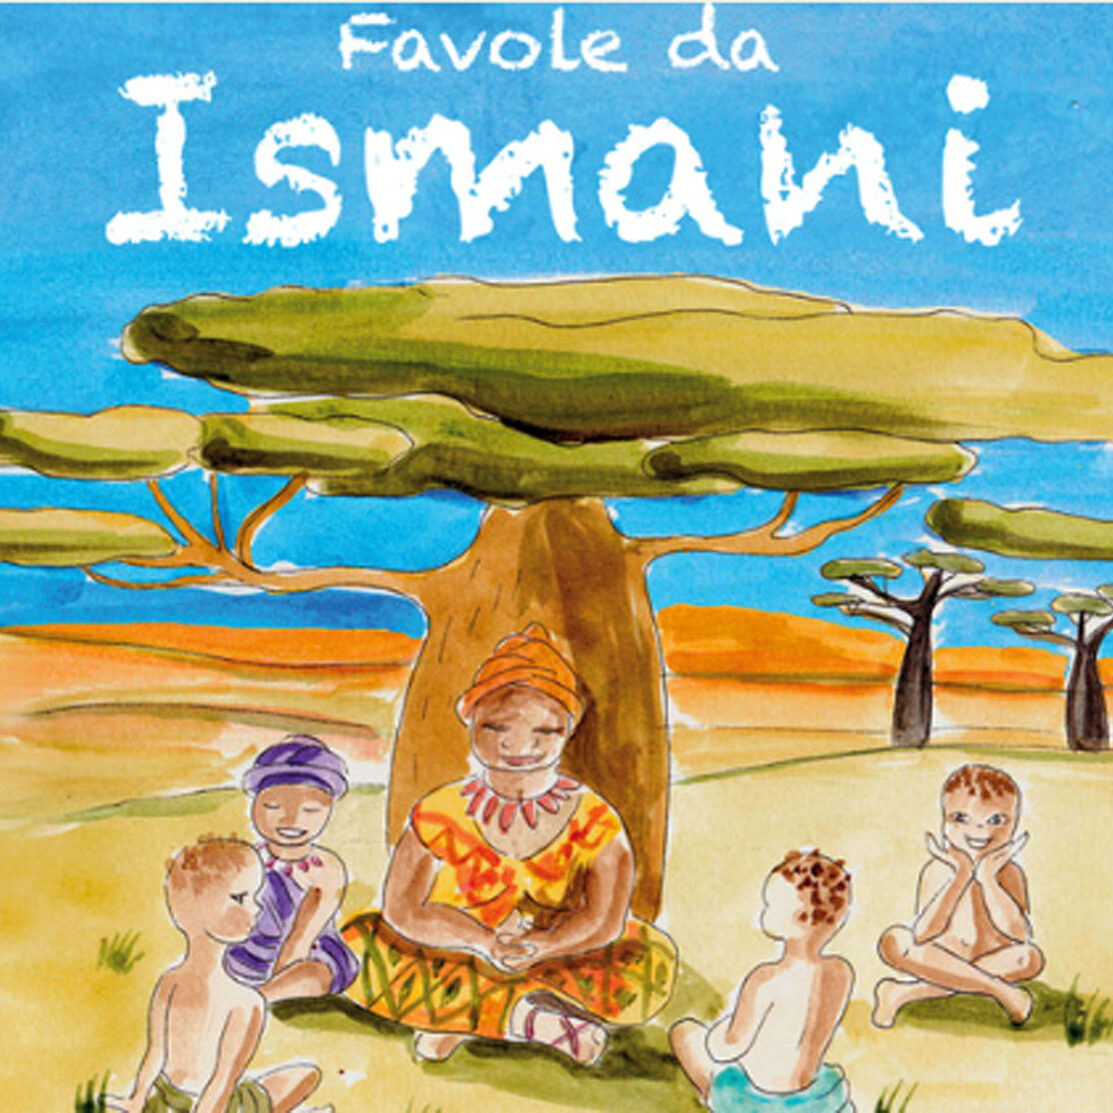 nyumbayetu-artigianato-africa-tanzania-favole-da-ismani-1